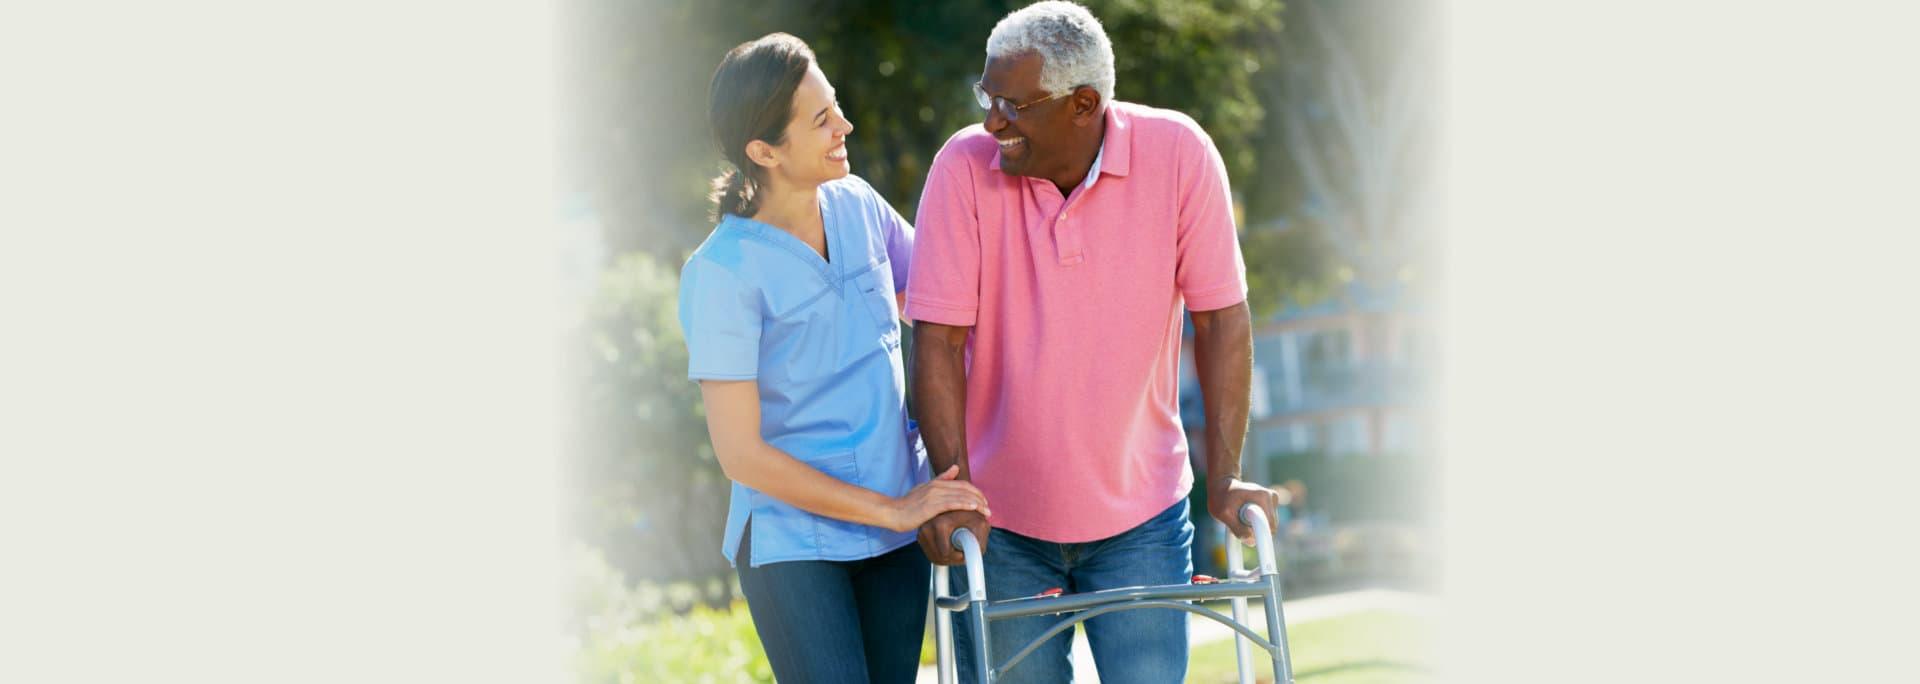 caregiver and senior man laughing